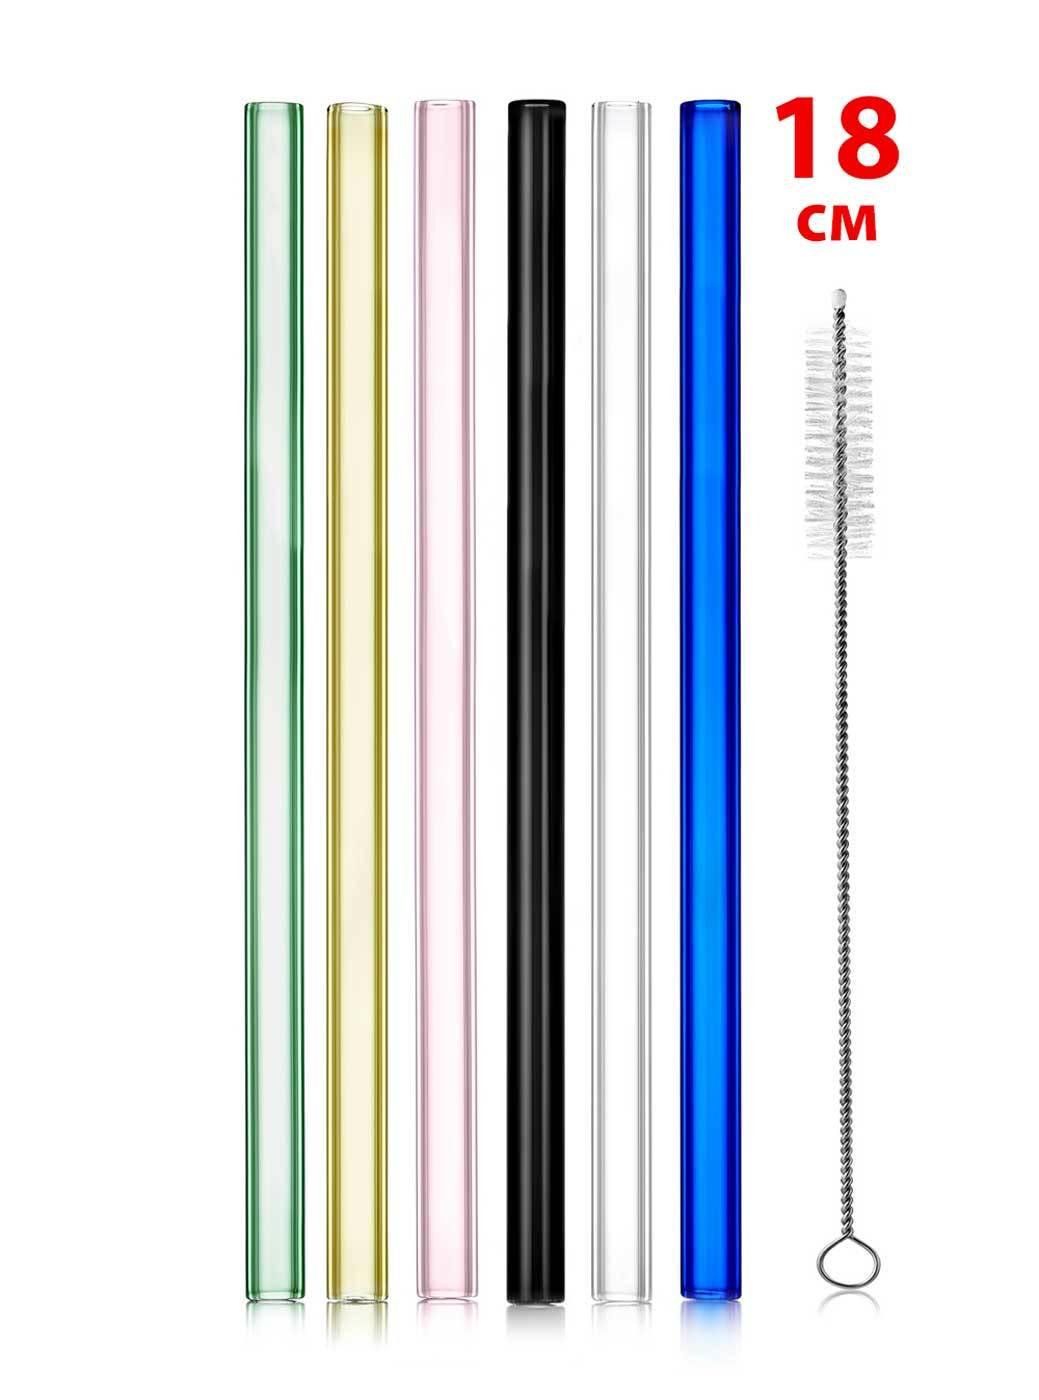 Аксессуары Стеклянная коктейльная трубочка прямая 18 см, разноцветные stekliannie-trubochki-nabor18-teastar.jpg